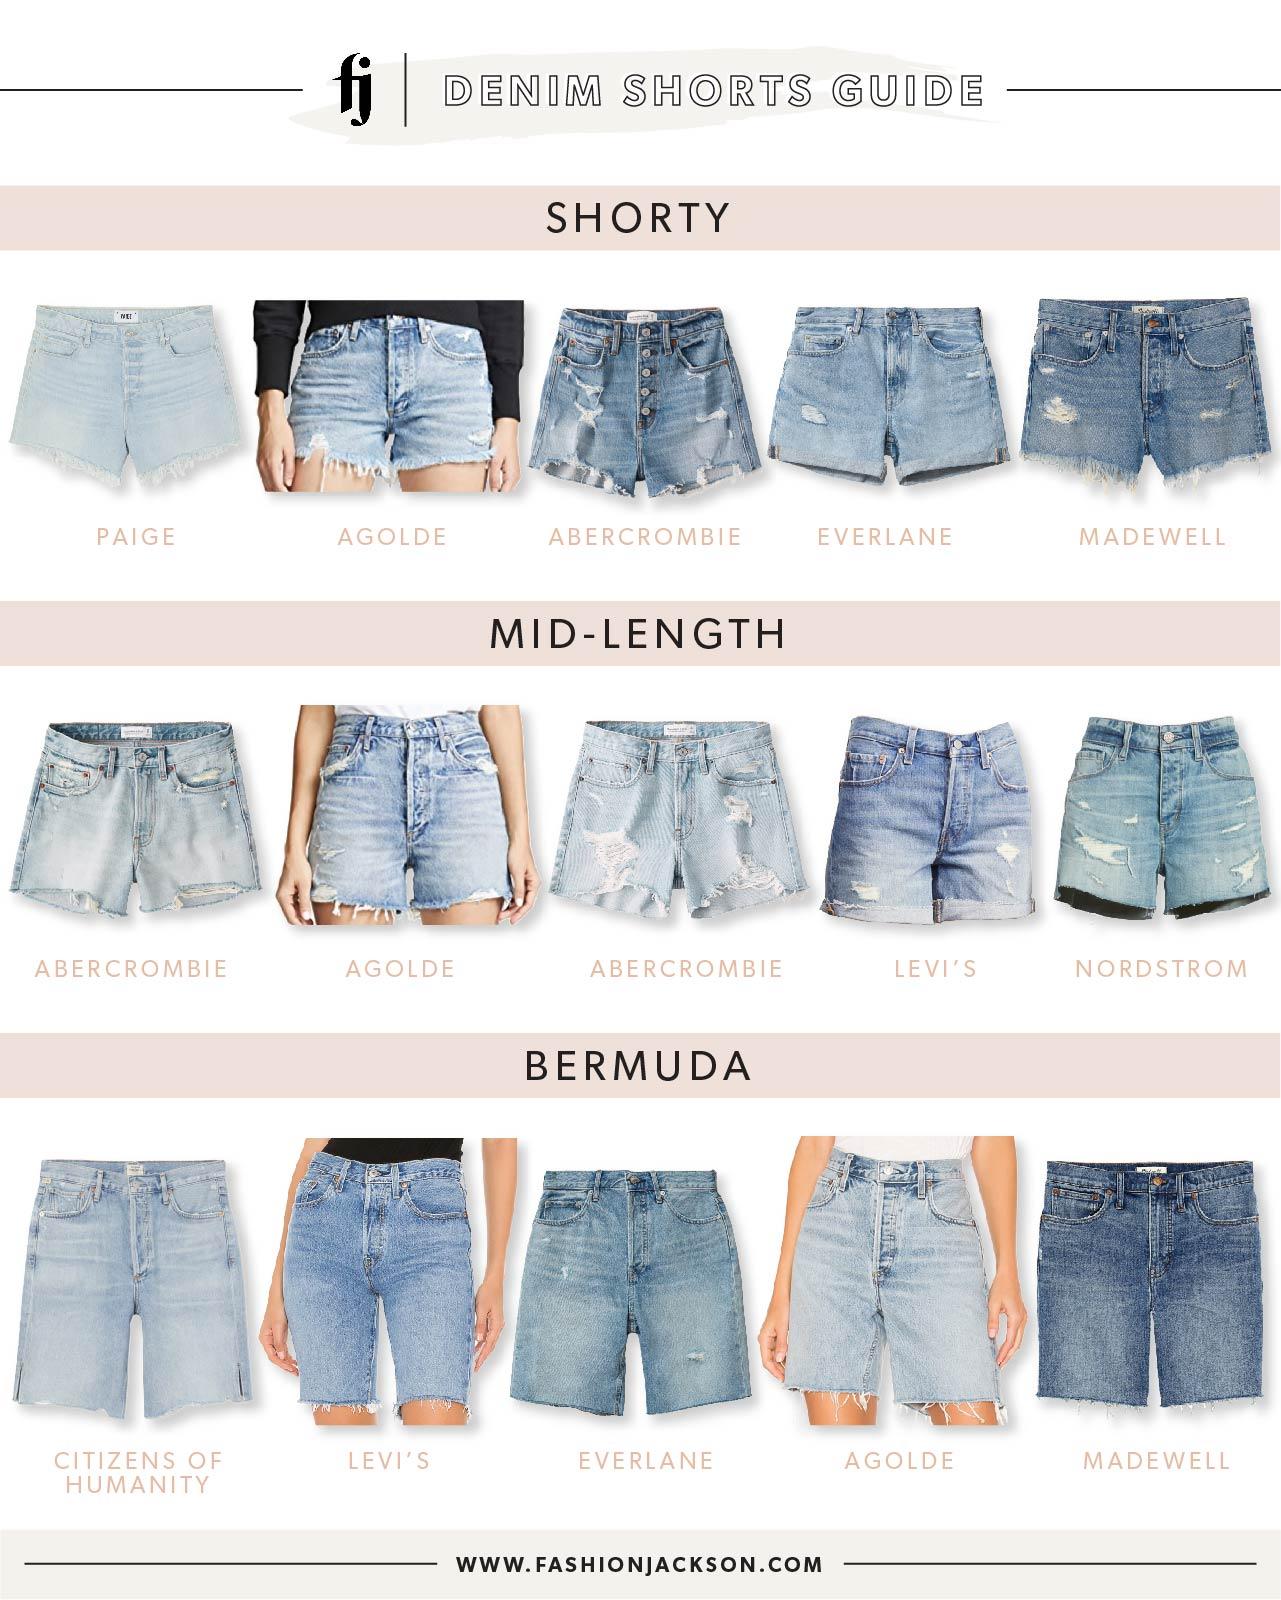 FJ_Denim Shorts Guide_LTK-01